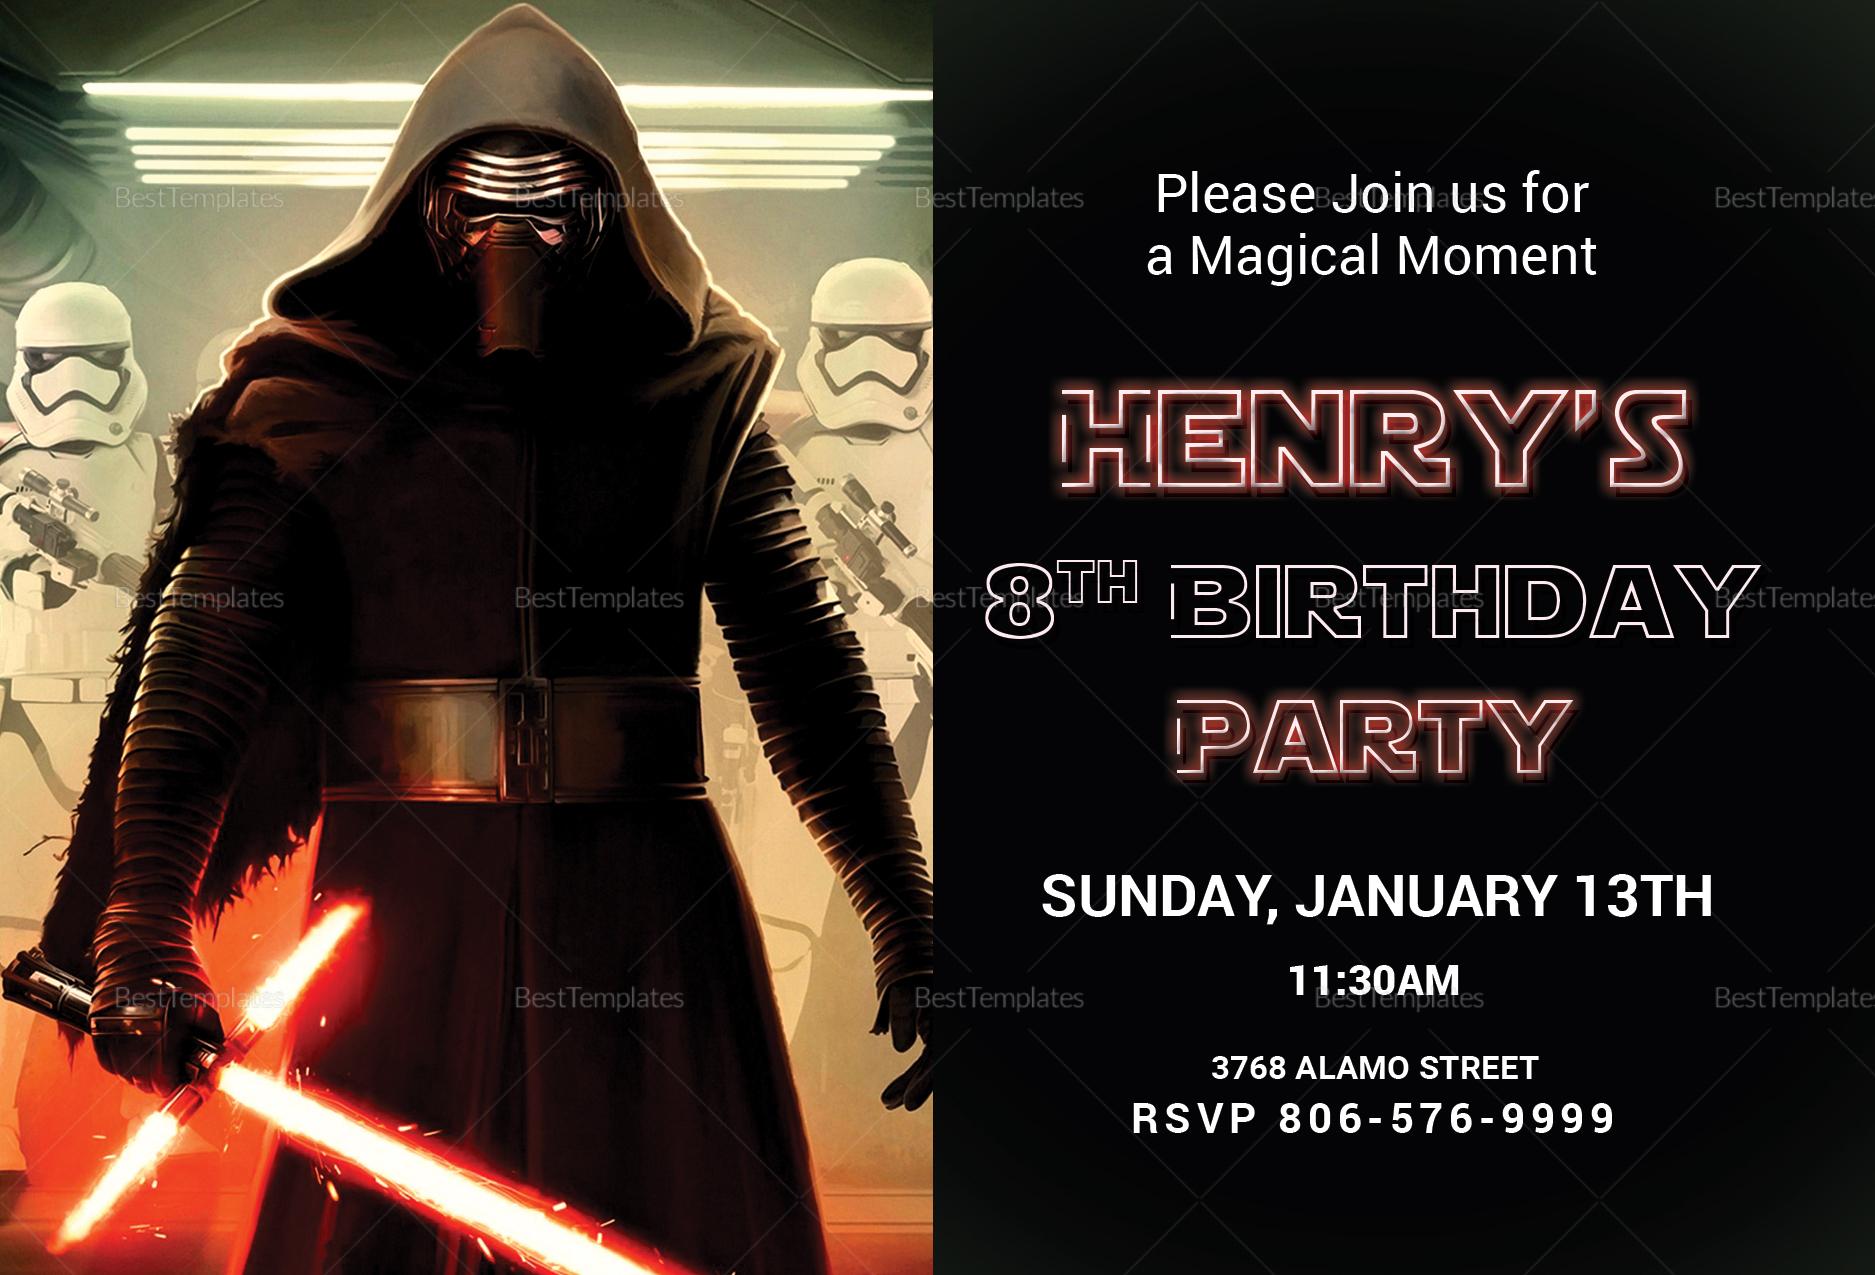 Lego Themed Star Wars Birthday Invitation Template